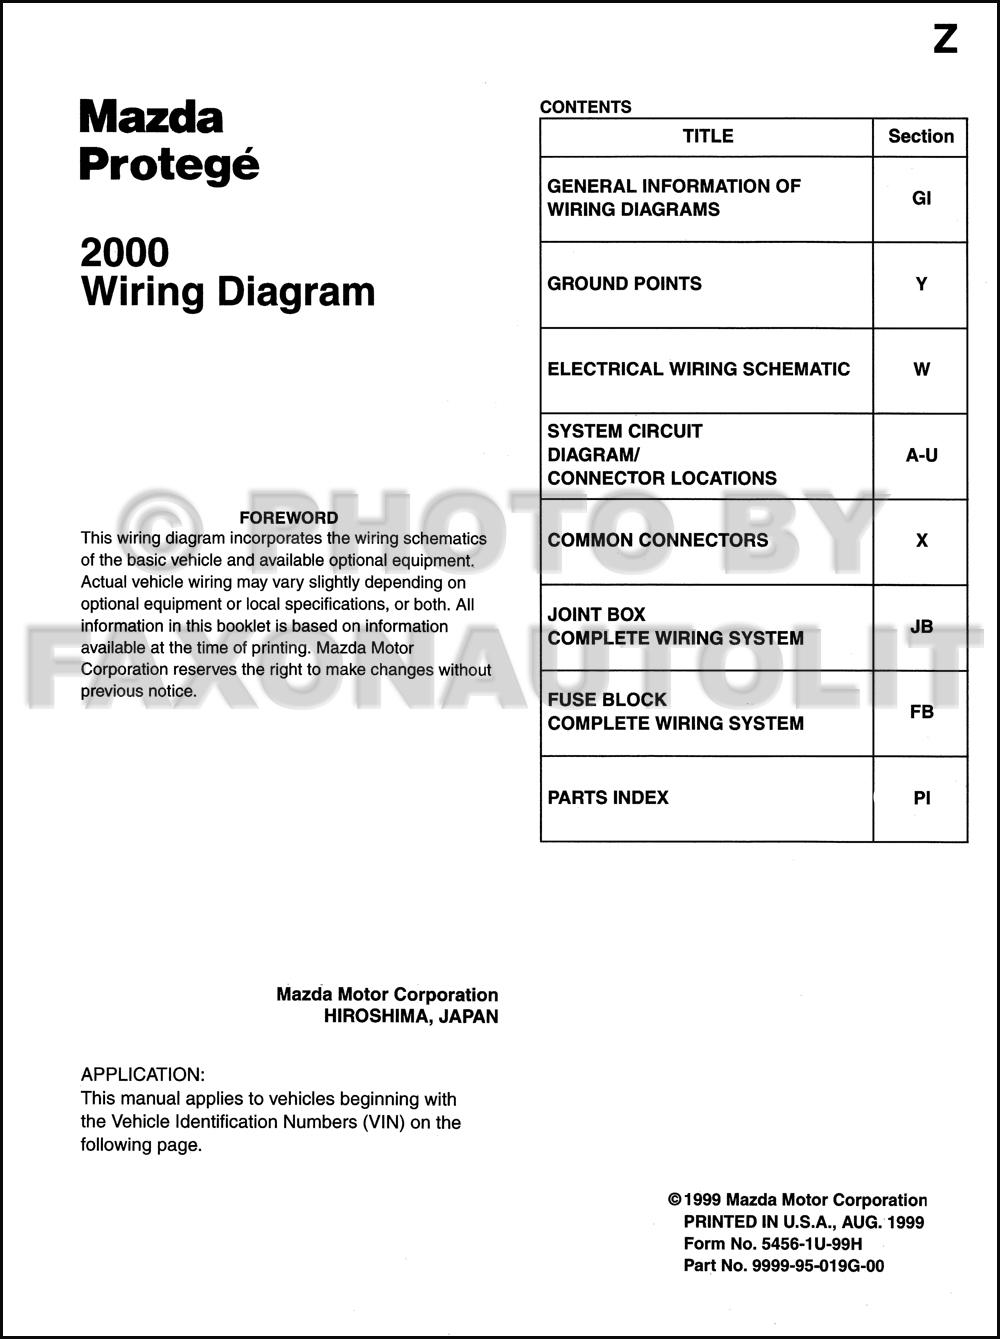 2003 mazda protege wiring diagram 2003 image 2003 mazda protege radio wiring diagram jodebal com on 2003 mazda protege wiring diagram